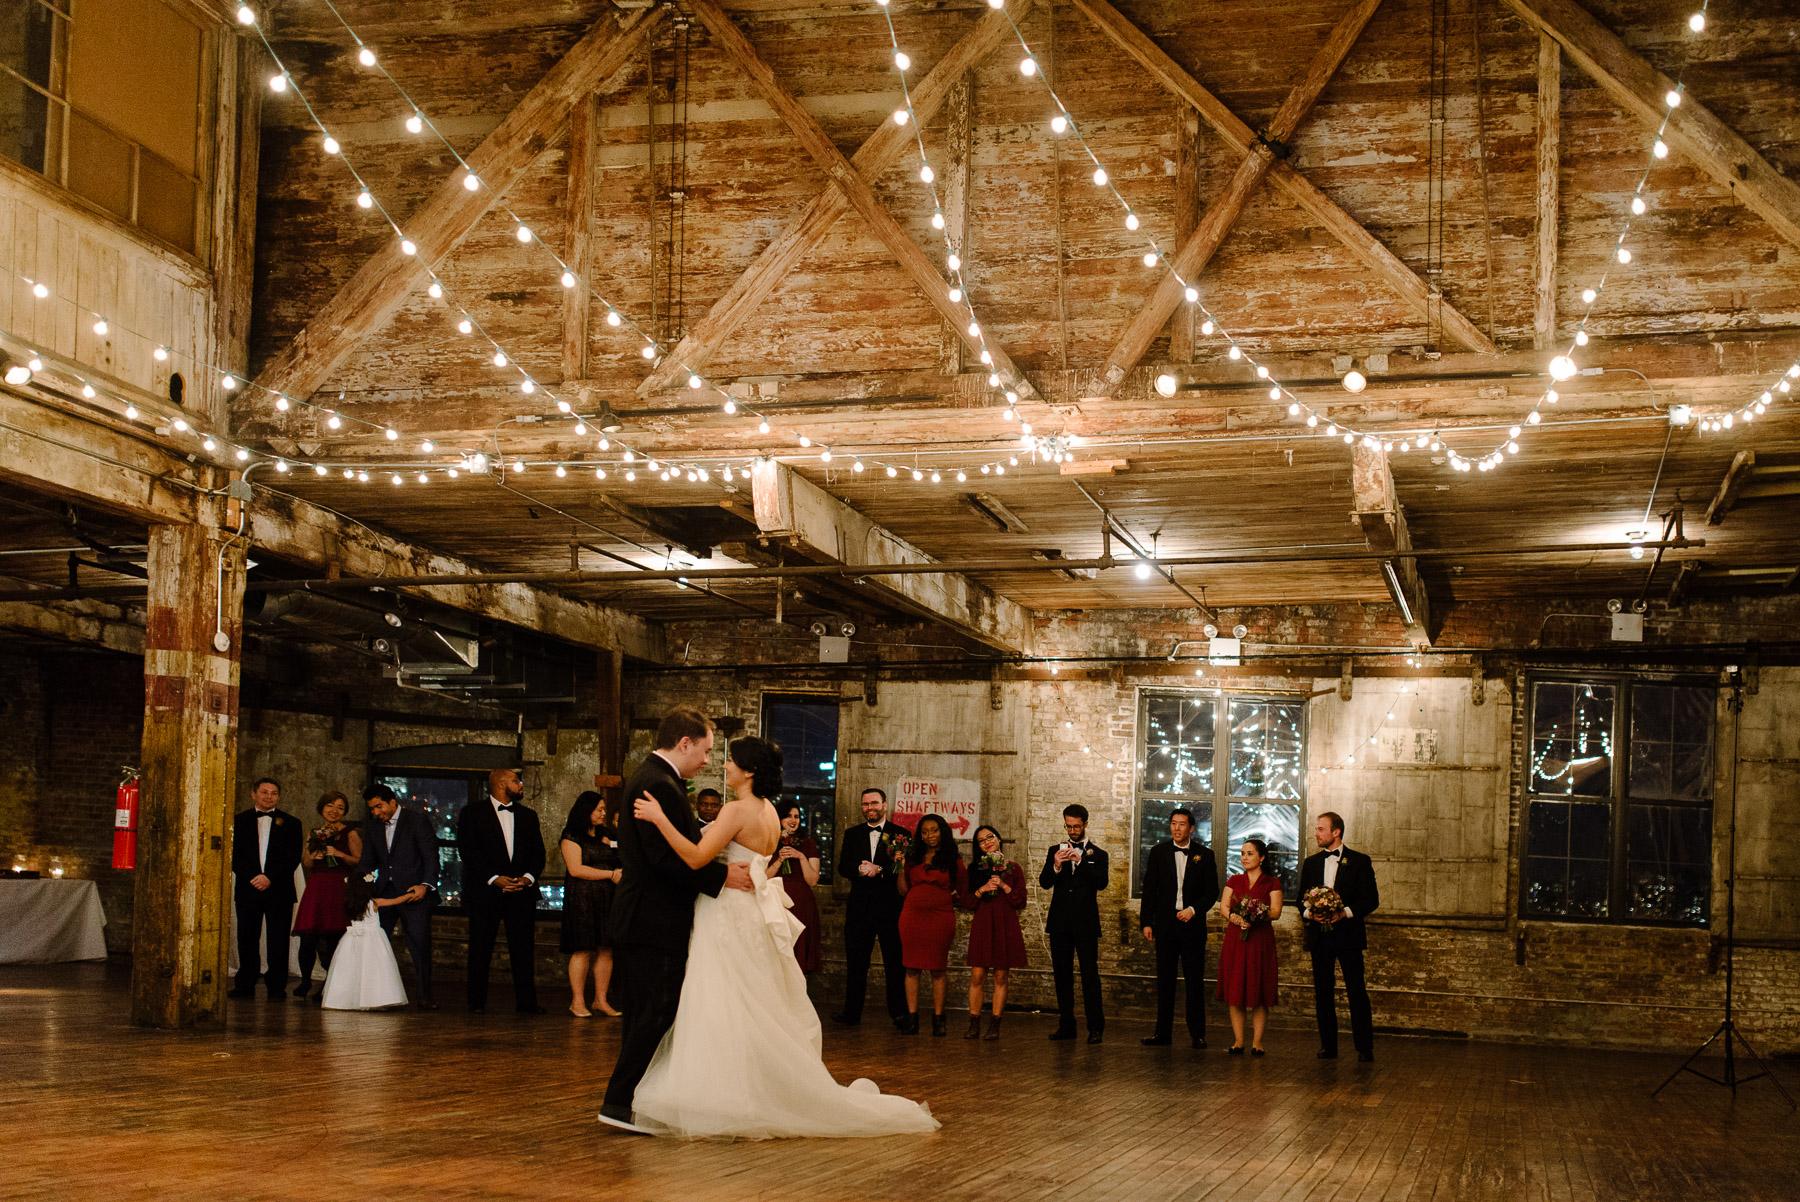 greenpoint-loft-brooklyn-wedding-photos-39.jpg